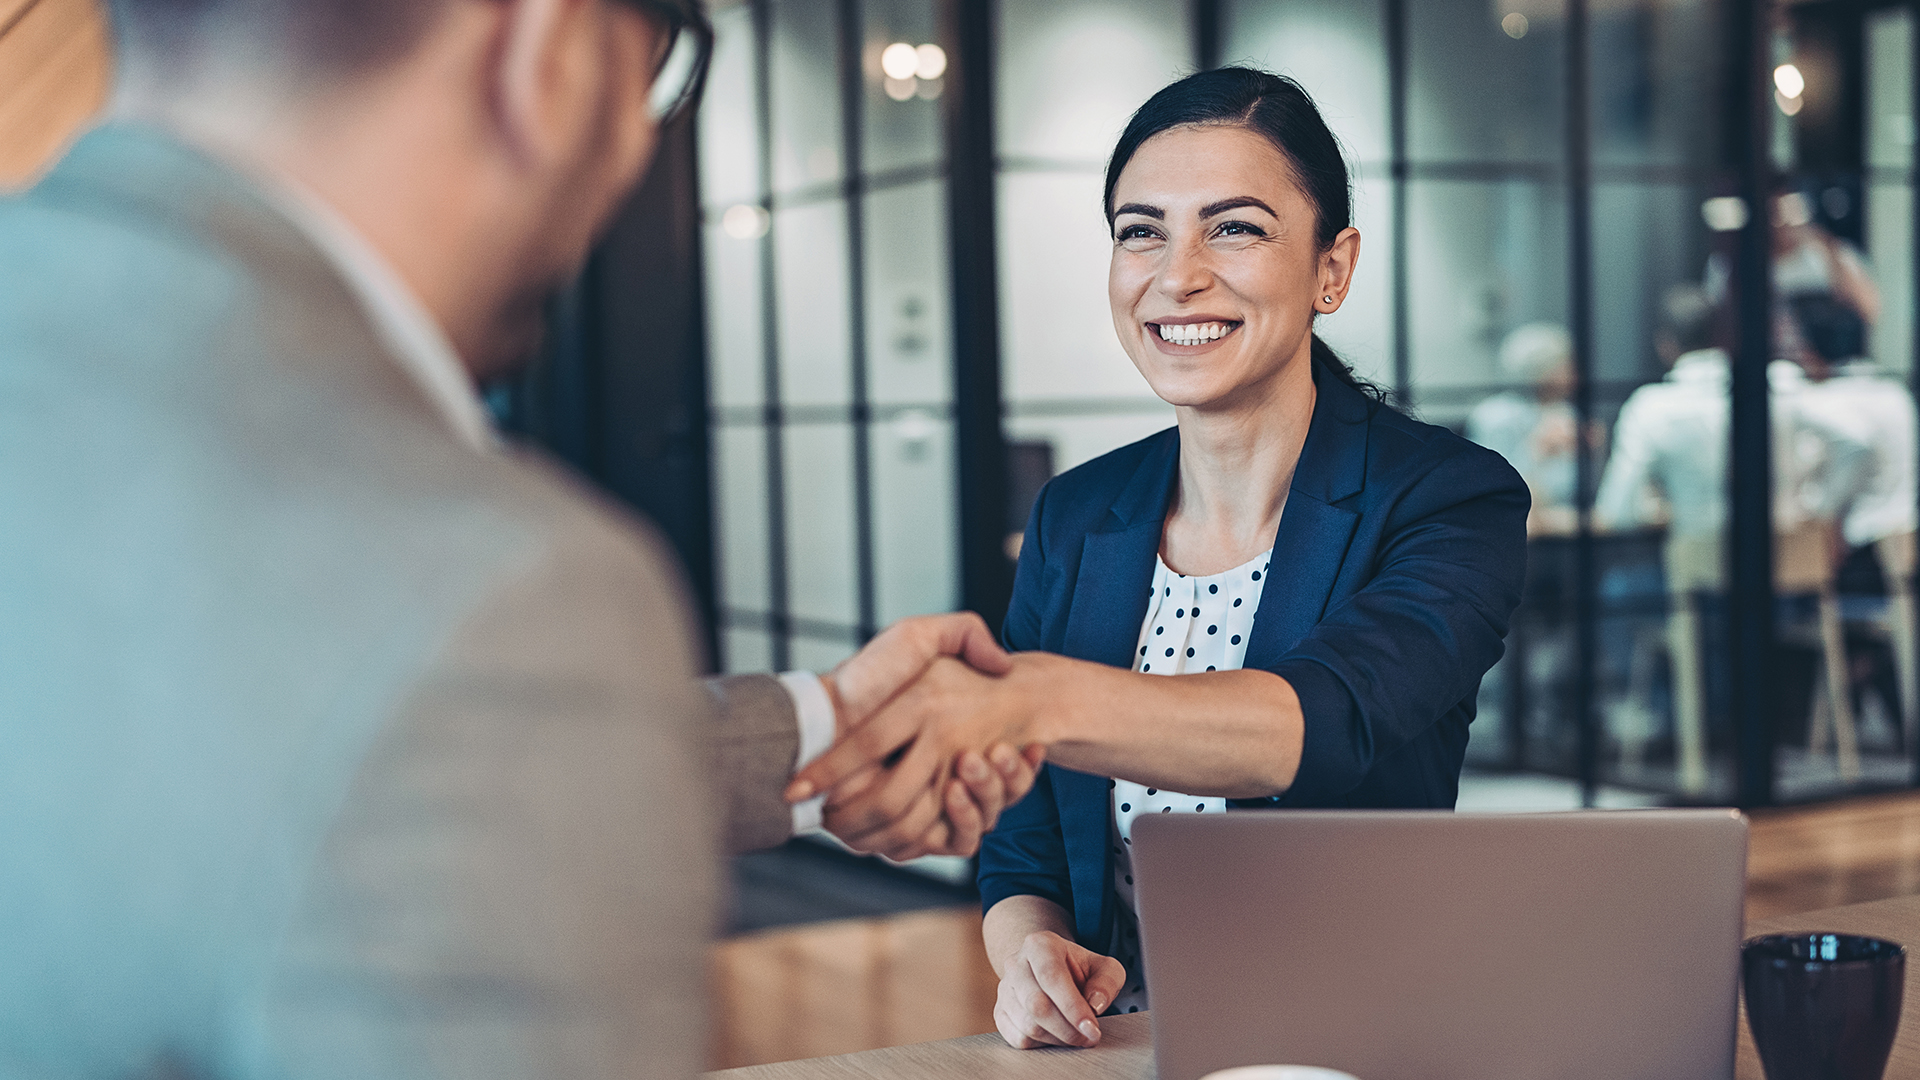 Pleasant business exchange